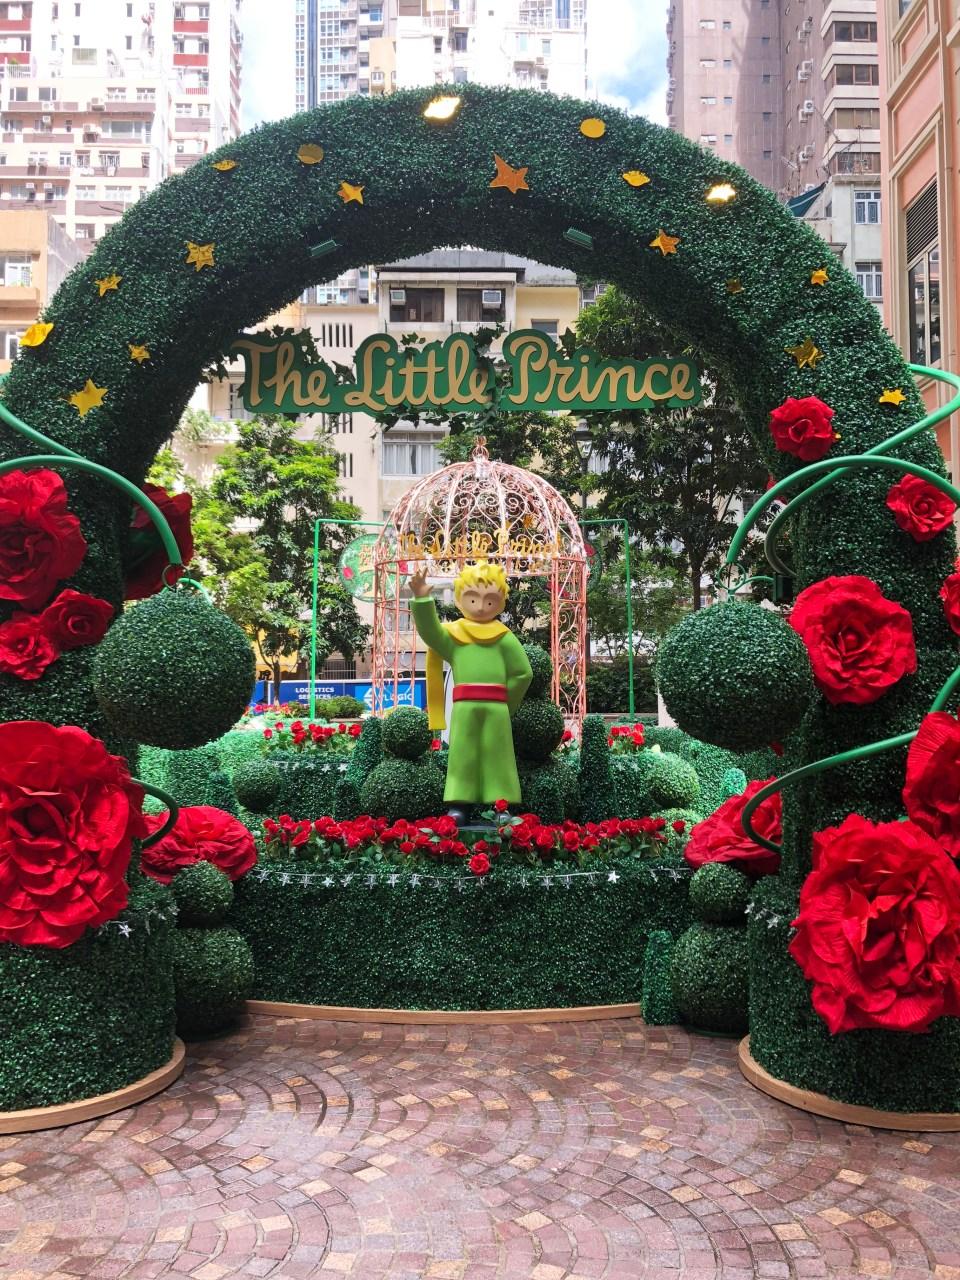 Hong Kong - Wan Chai - The Little Prince